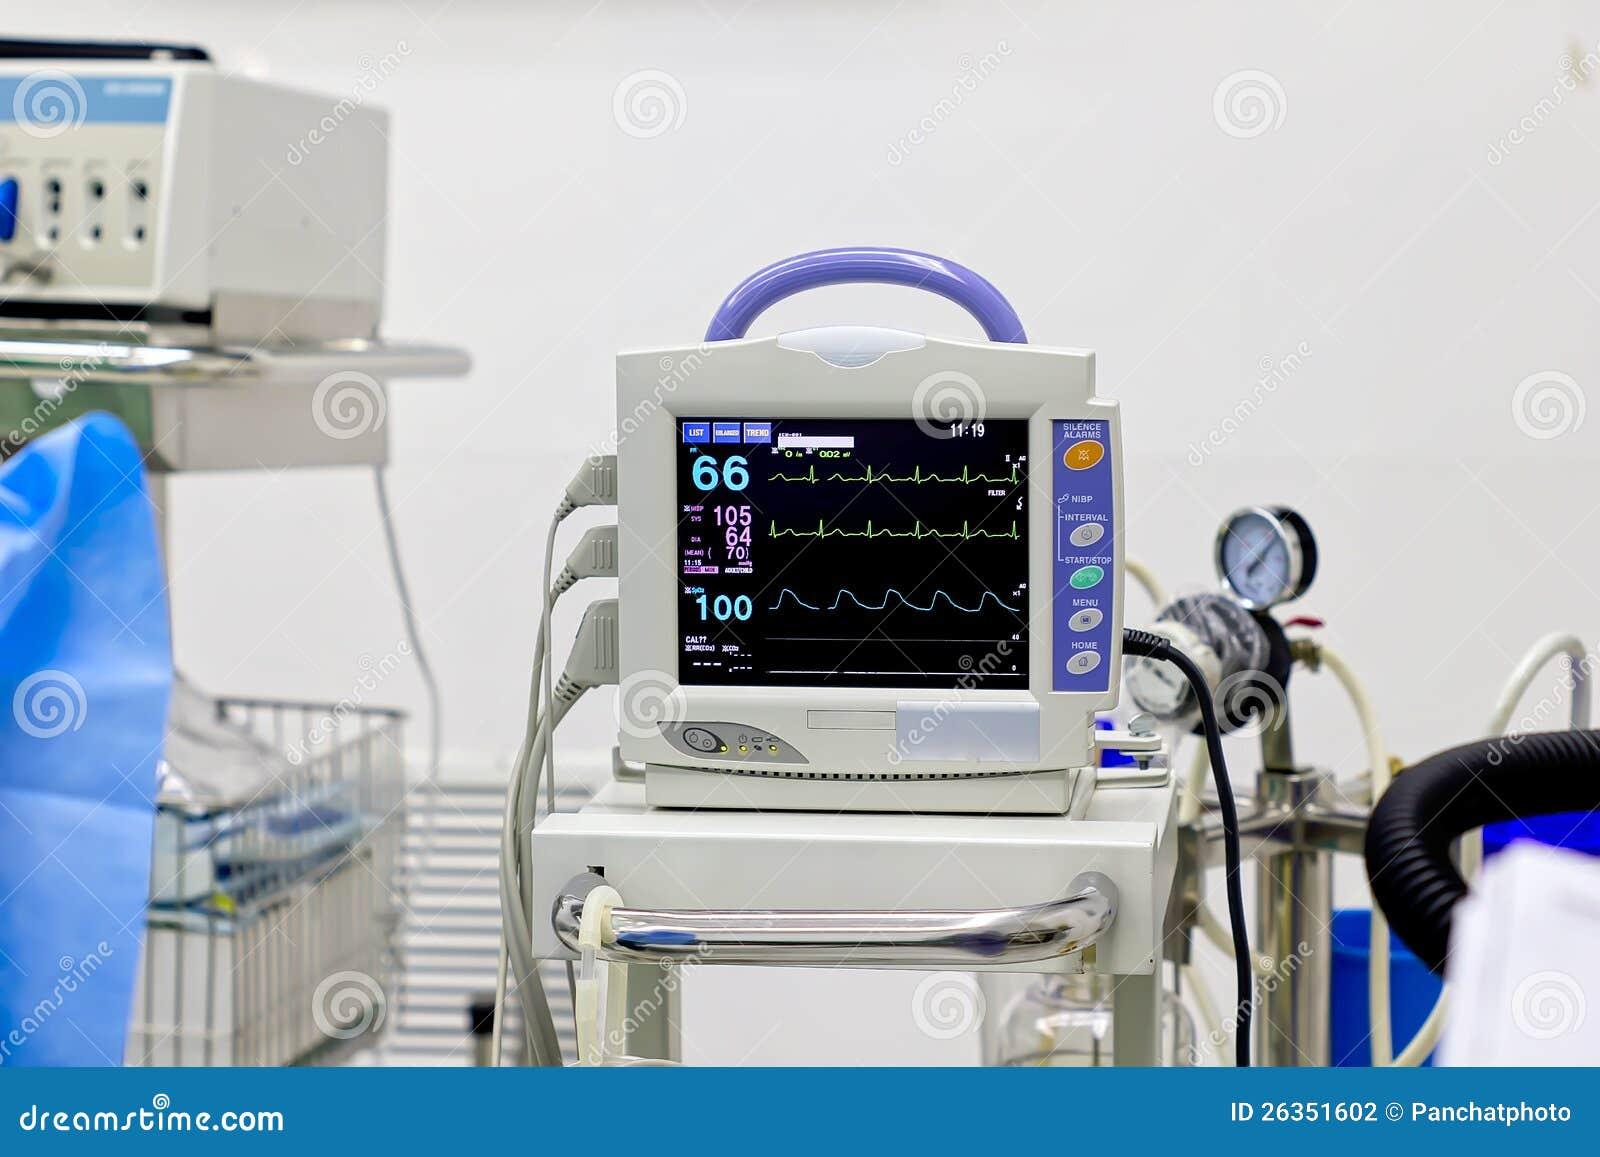 Heart Monitor Stock Photography - Image: 26351602